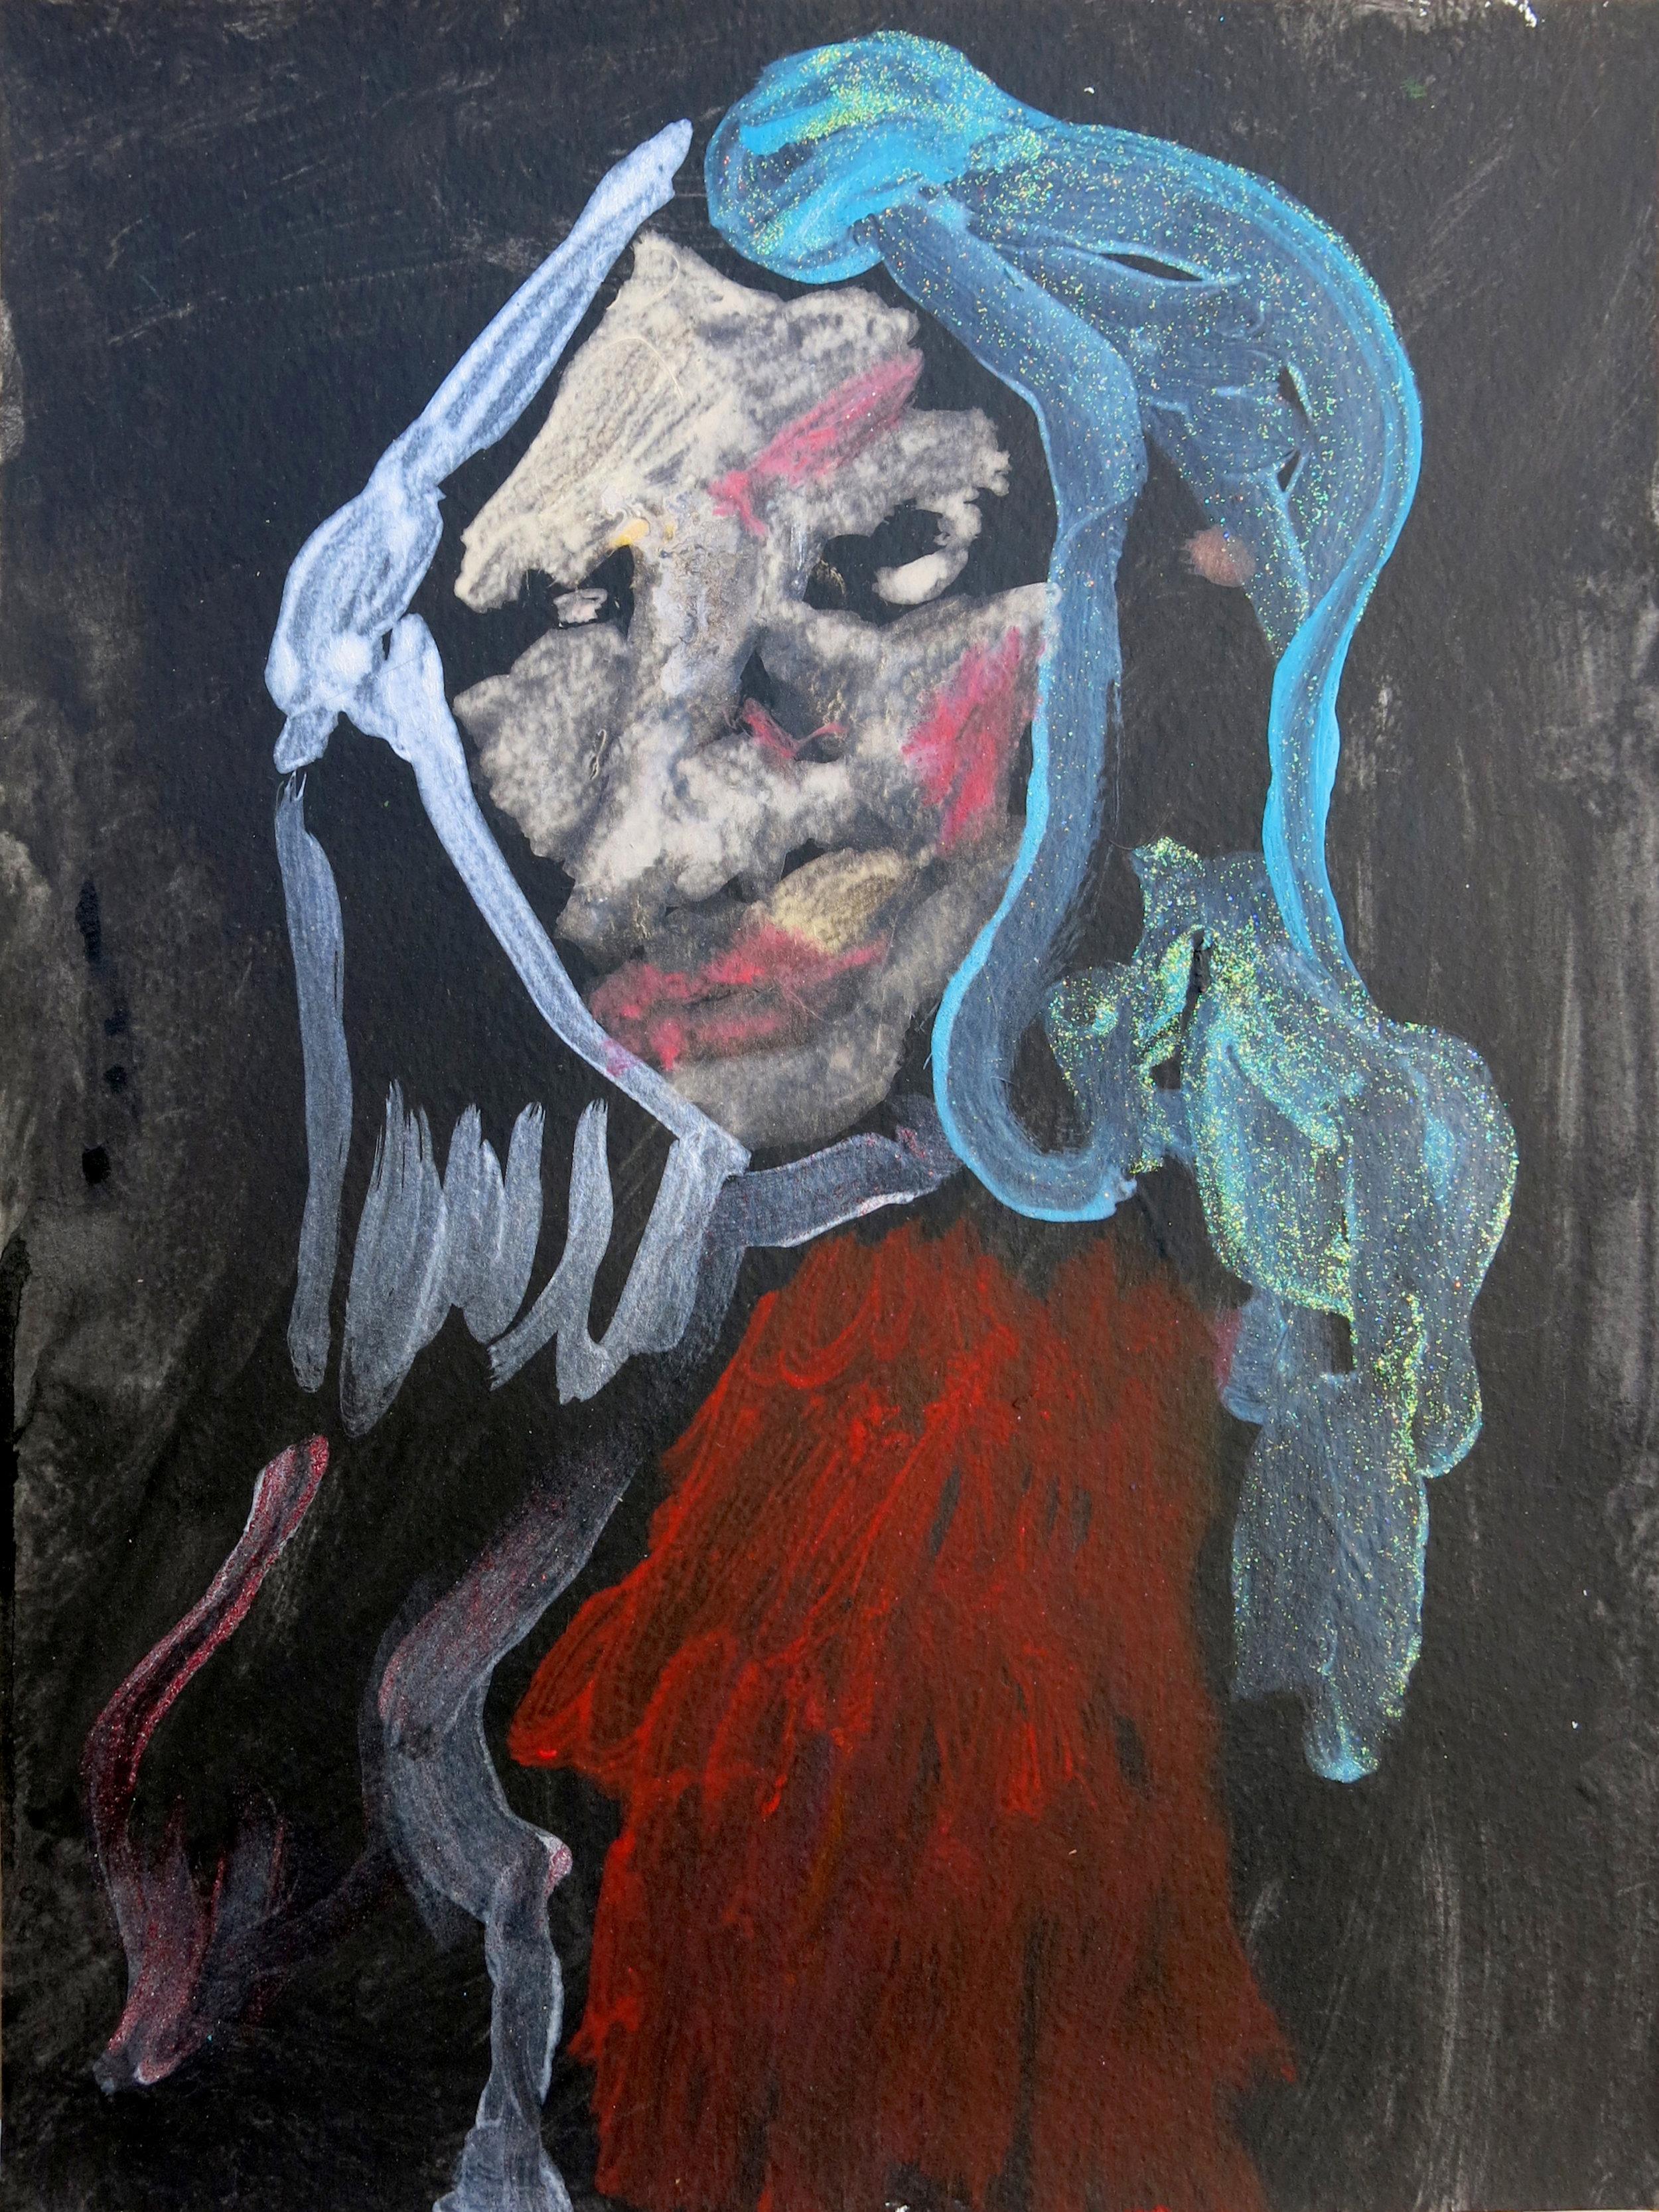 Barbra Streisand Portrait #148